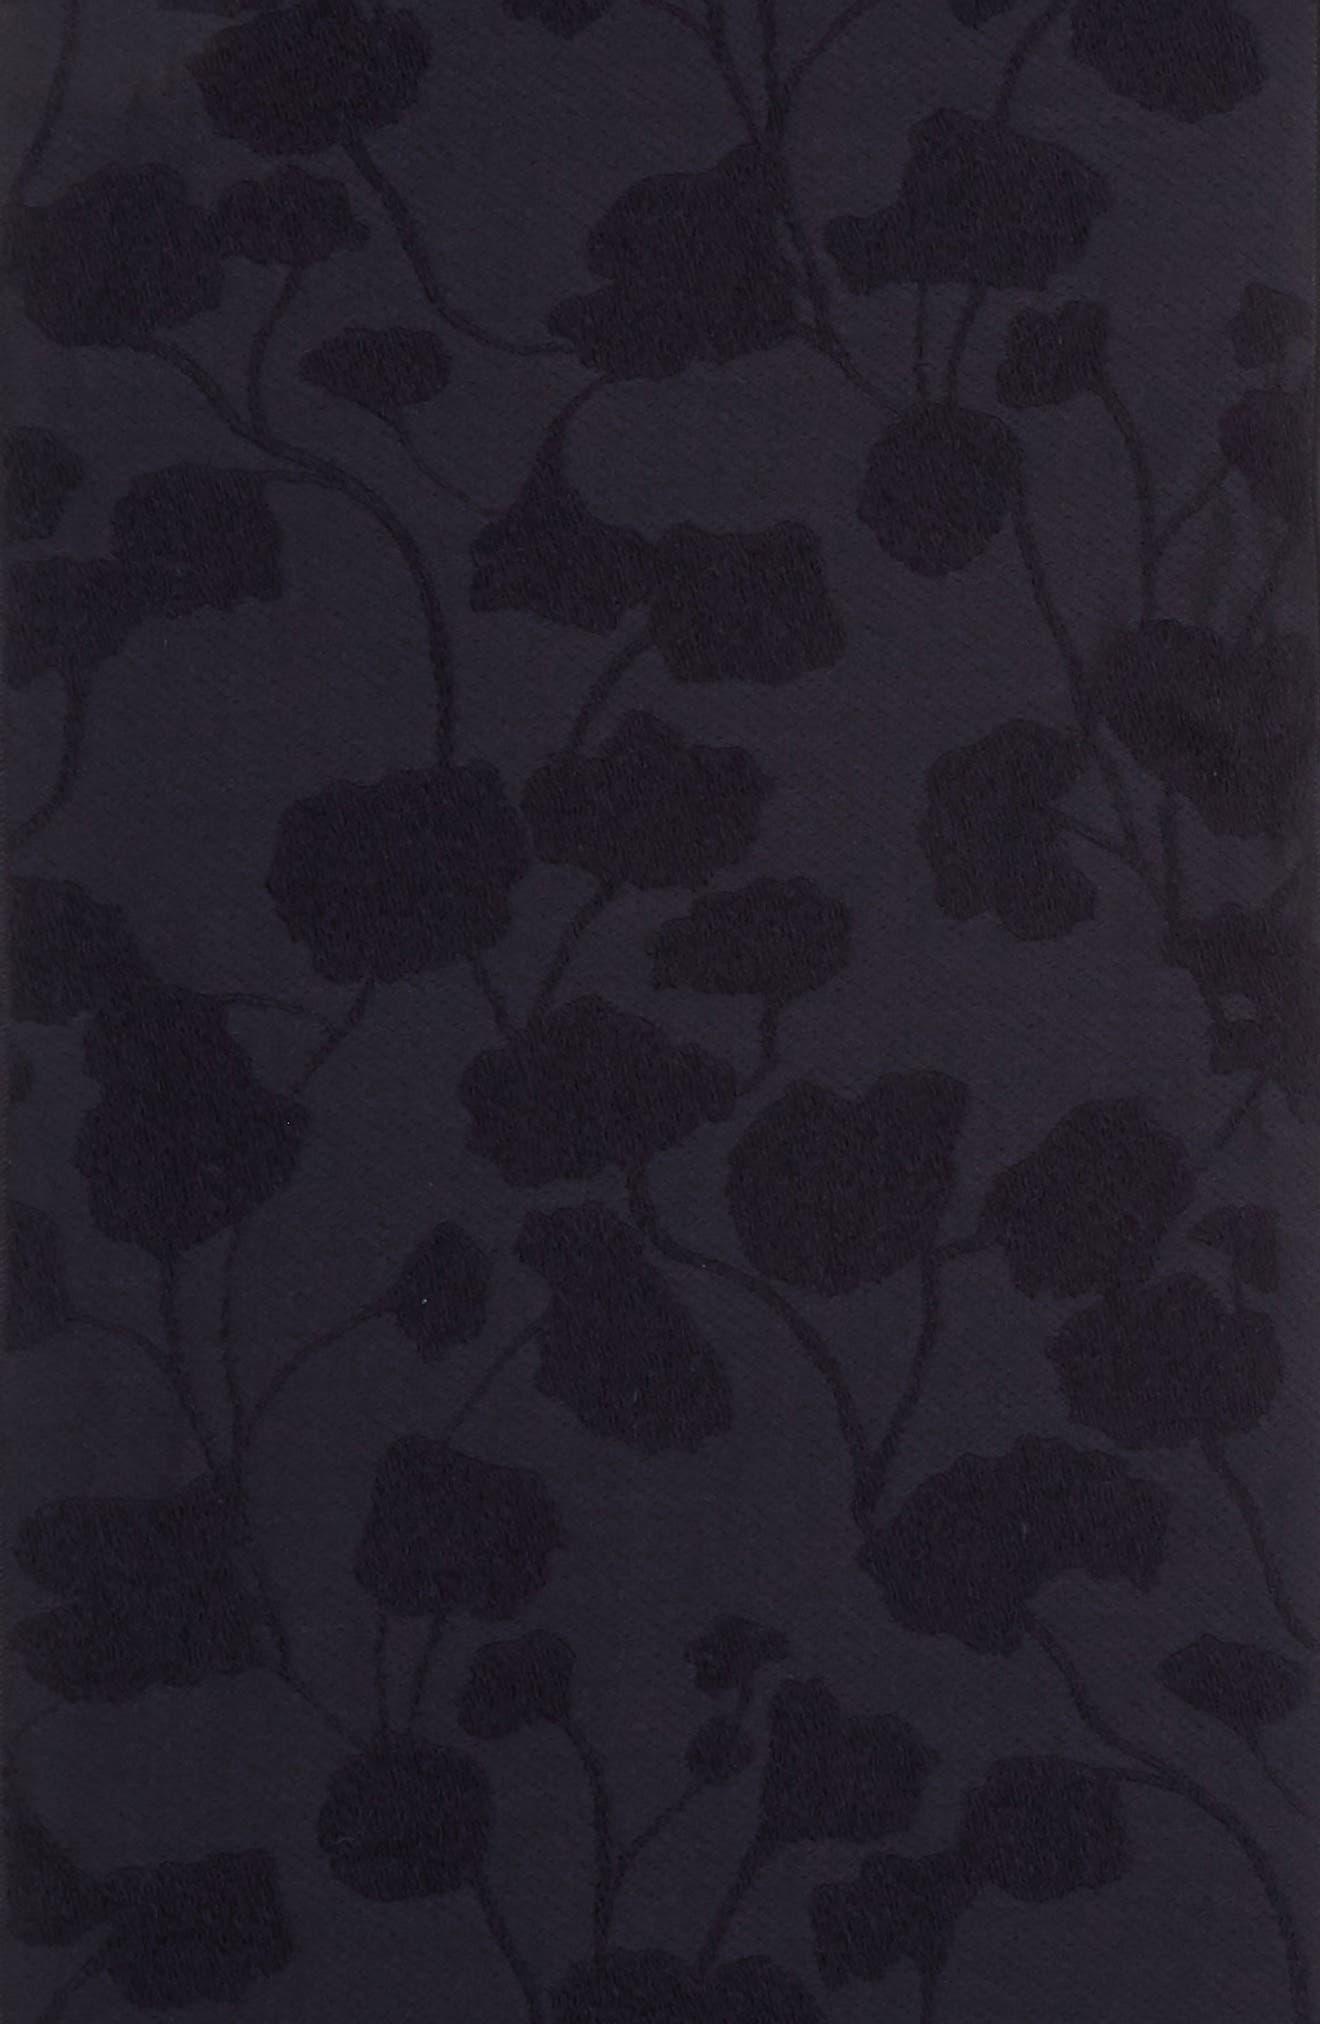 Floral Jacquard Scarf,                             Alternate thumbnail 4, color,                             410